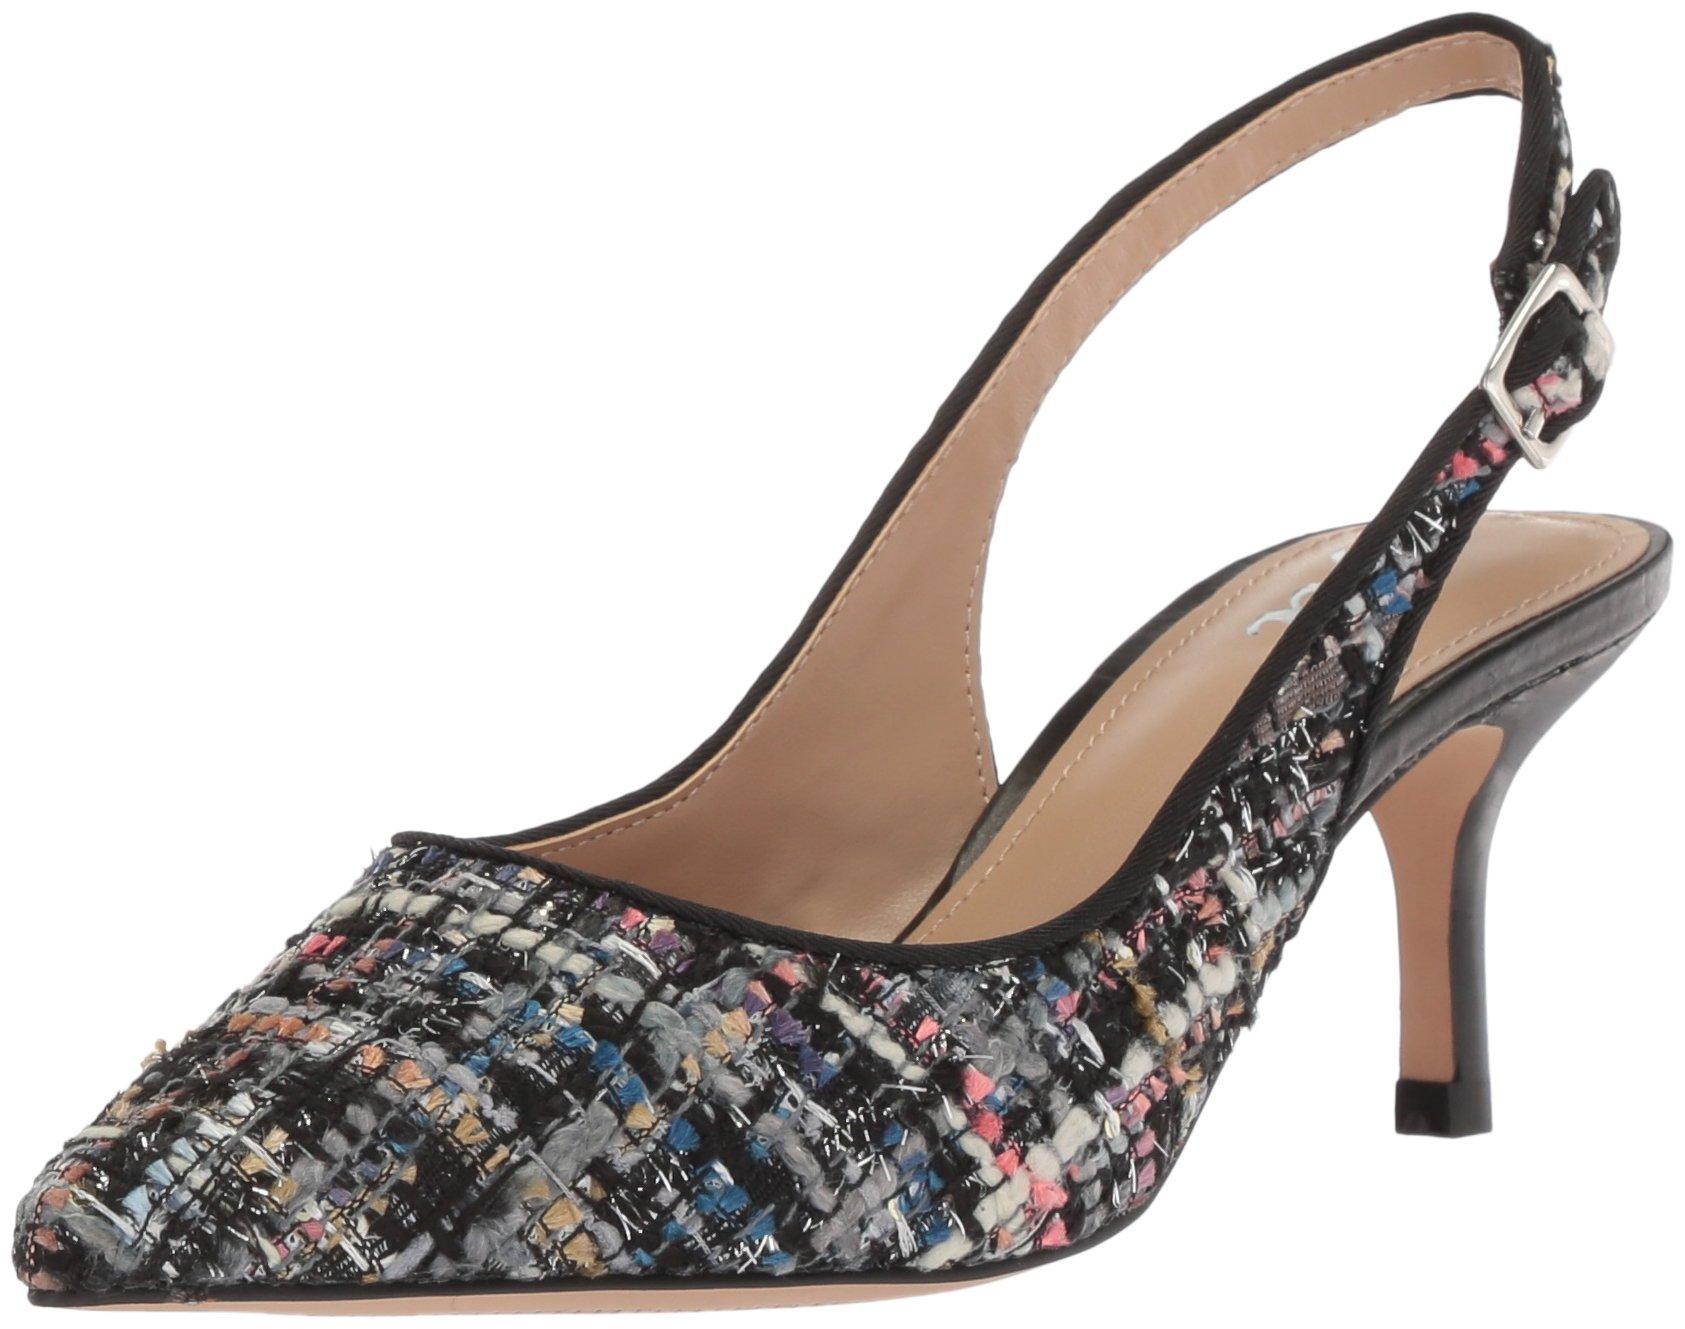 The Fix Women's Felicia Slingback Kitten Heel Pump, Black/Multi Tweed, 9 B US